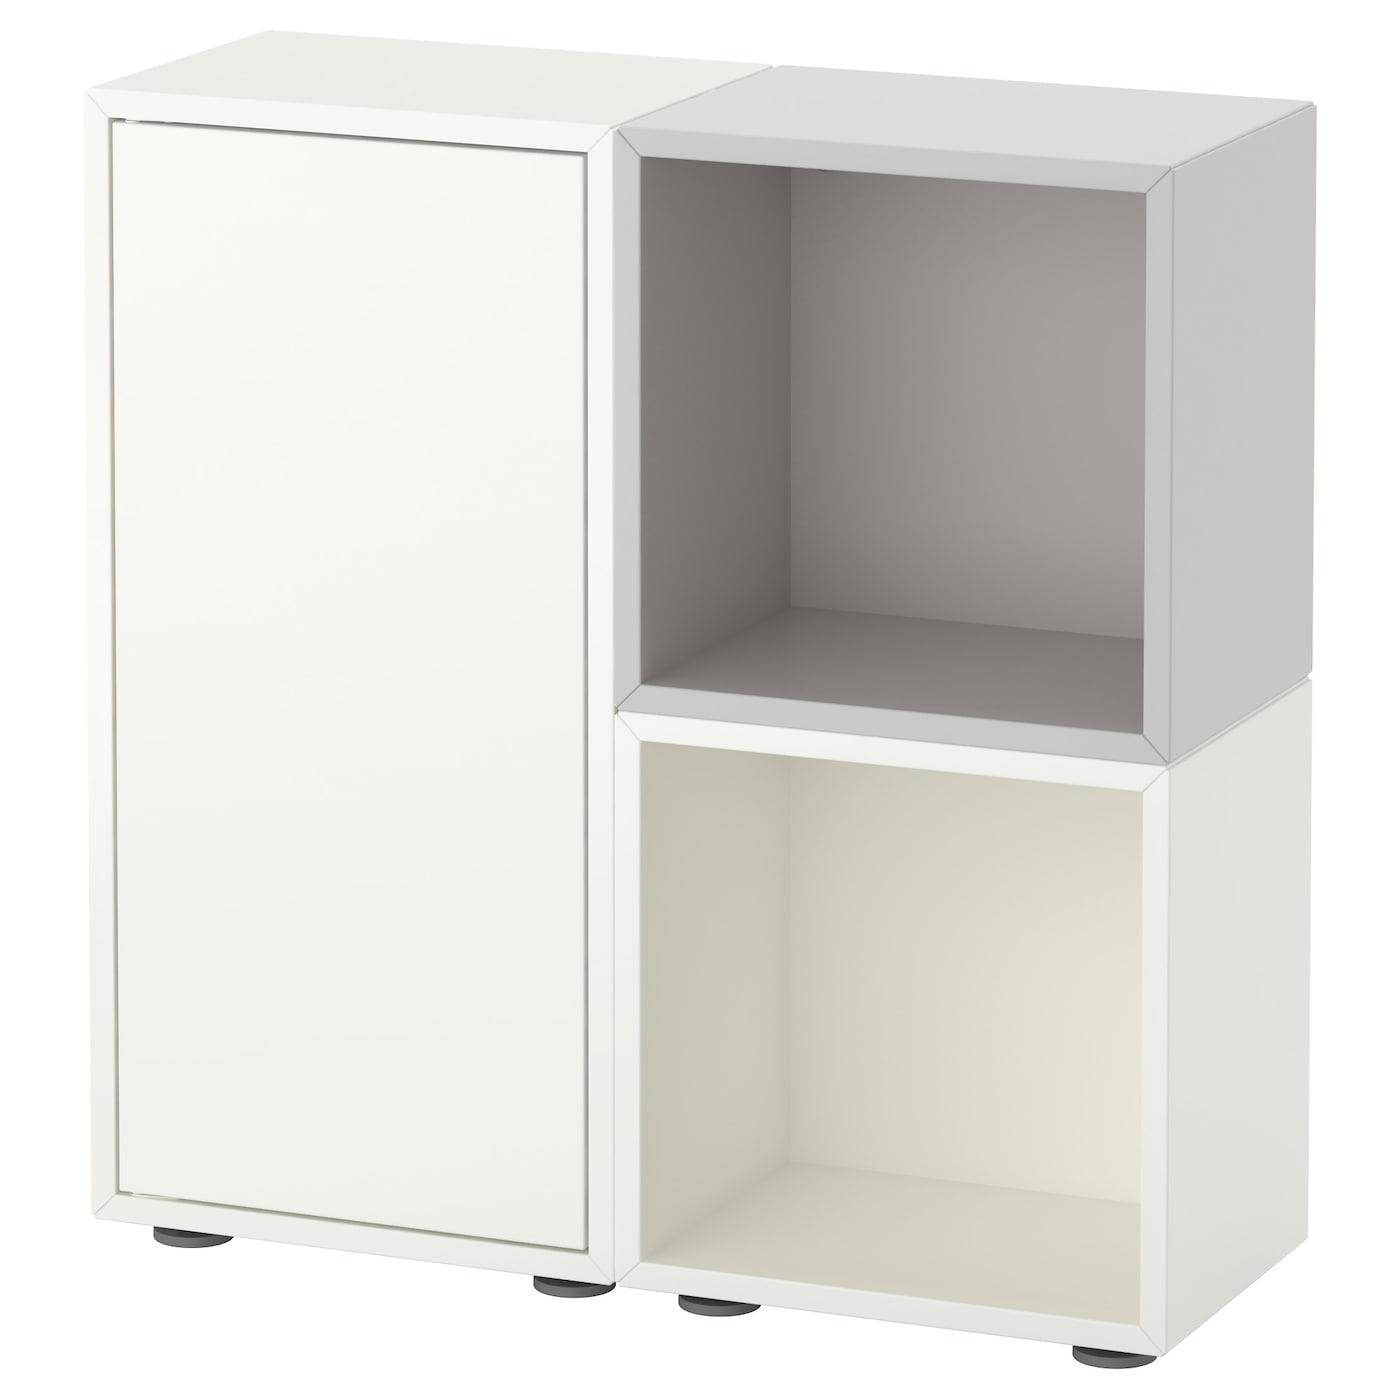 eket cabinet combination with feet white grey 70 x 25 x 72 cm ikea. Black Bedroom Furniture Sets. Home Design Ideas